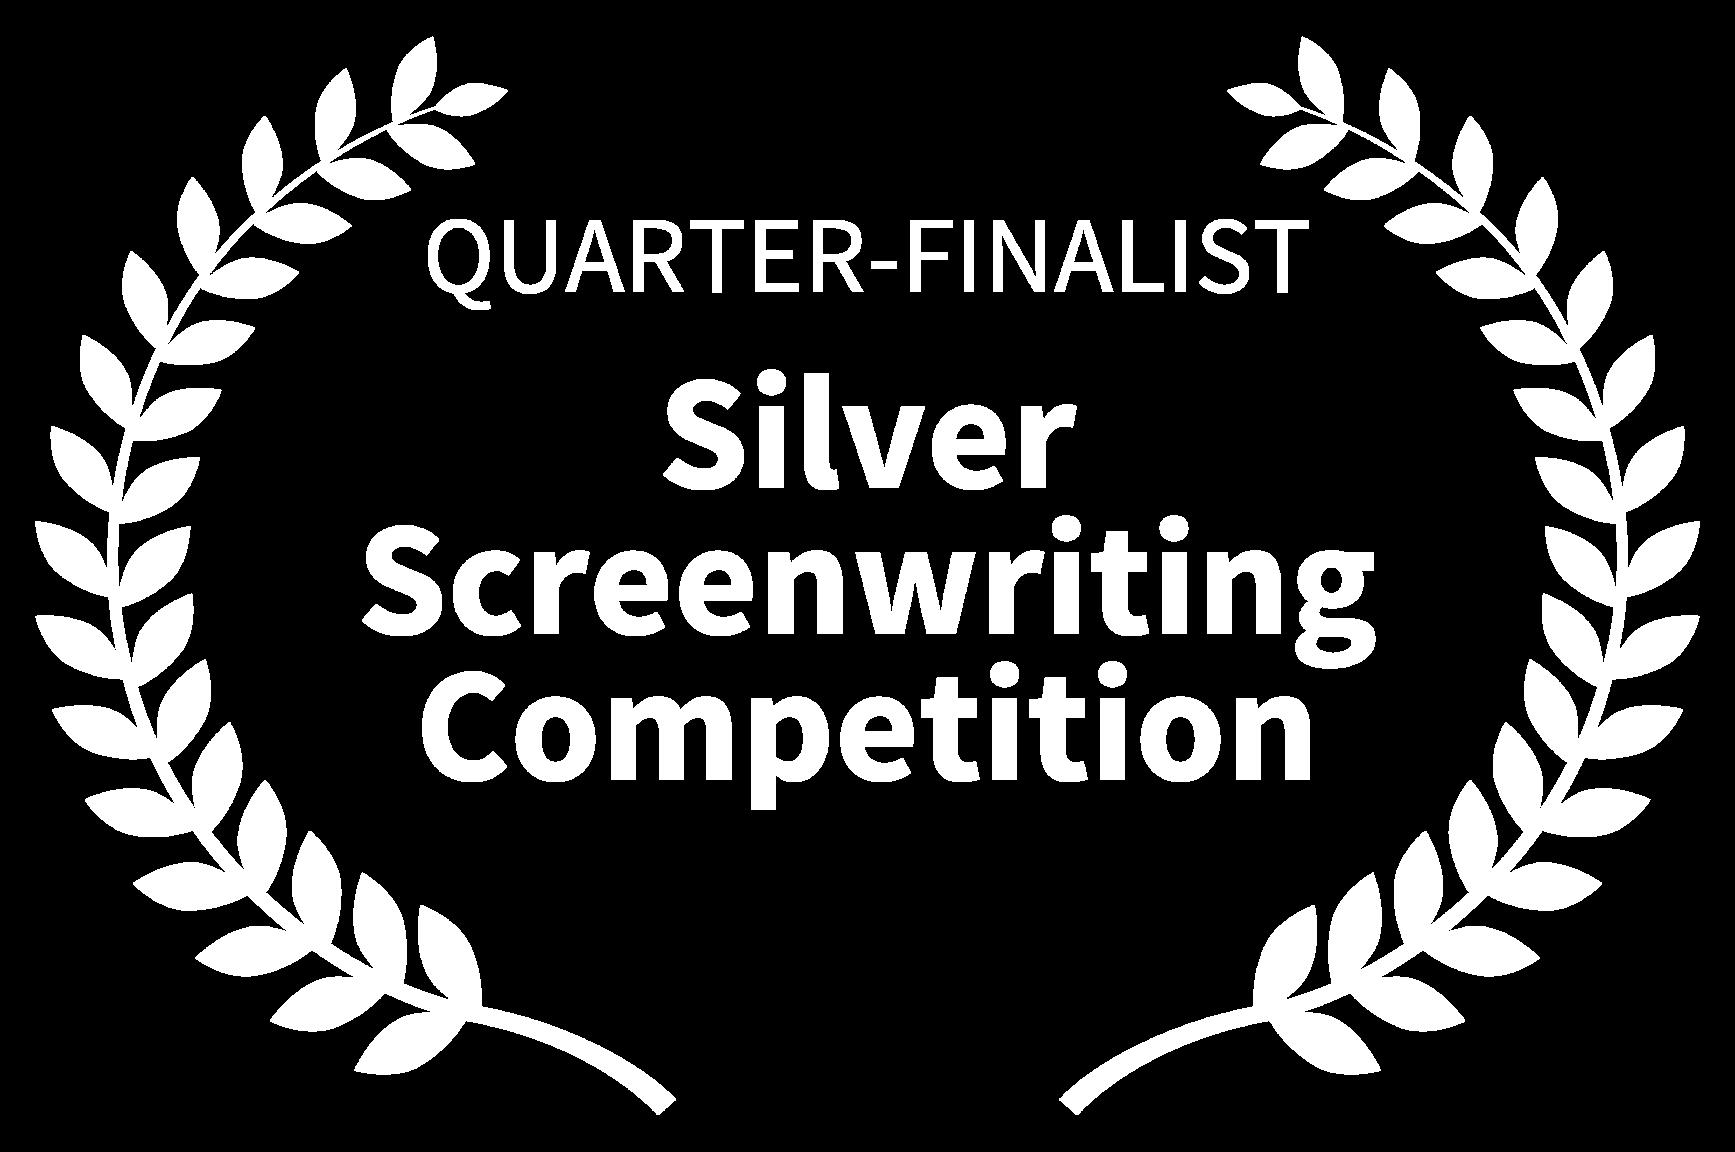 QUARTER-FINALIST - Silver Screenwriting Competition